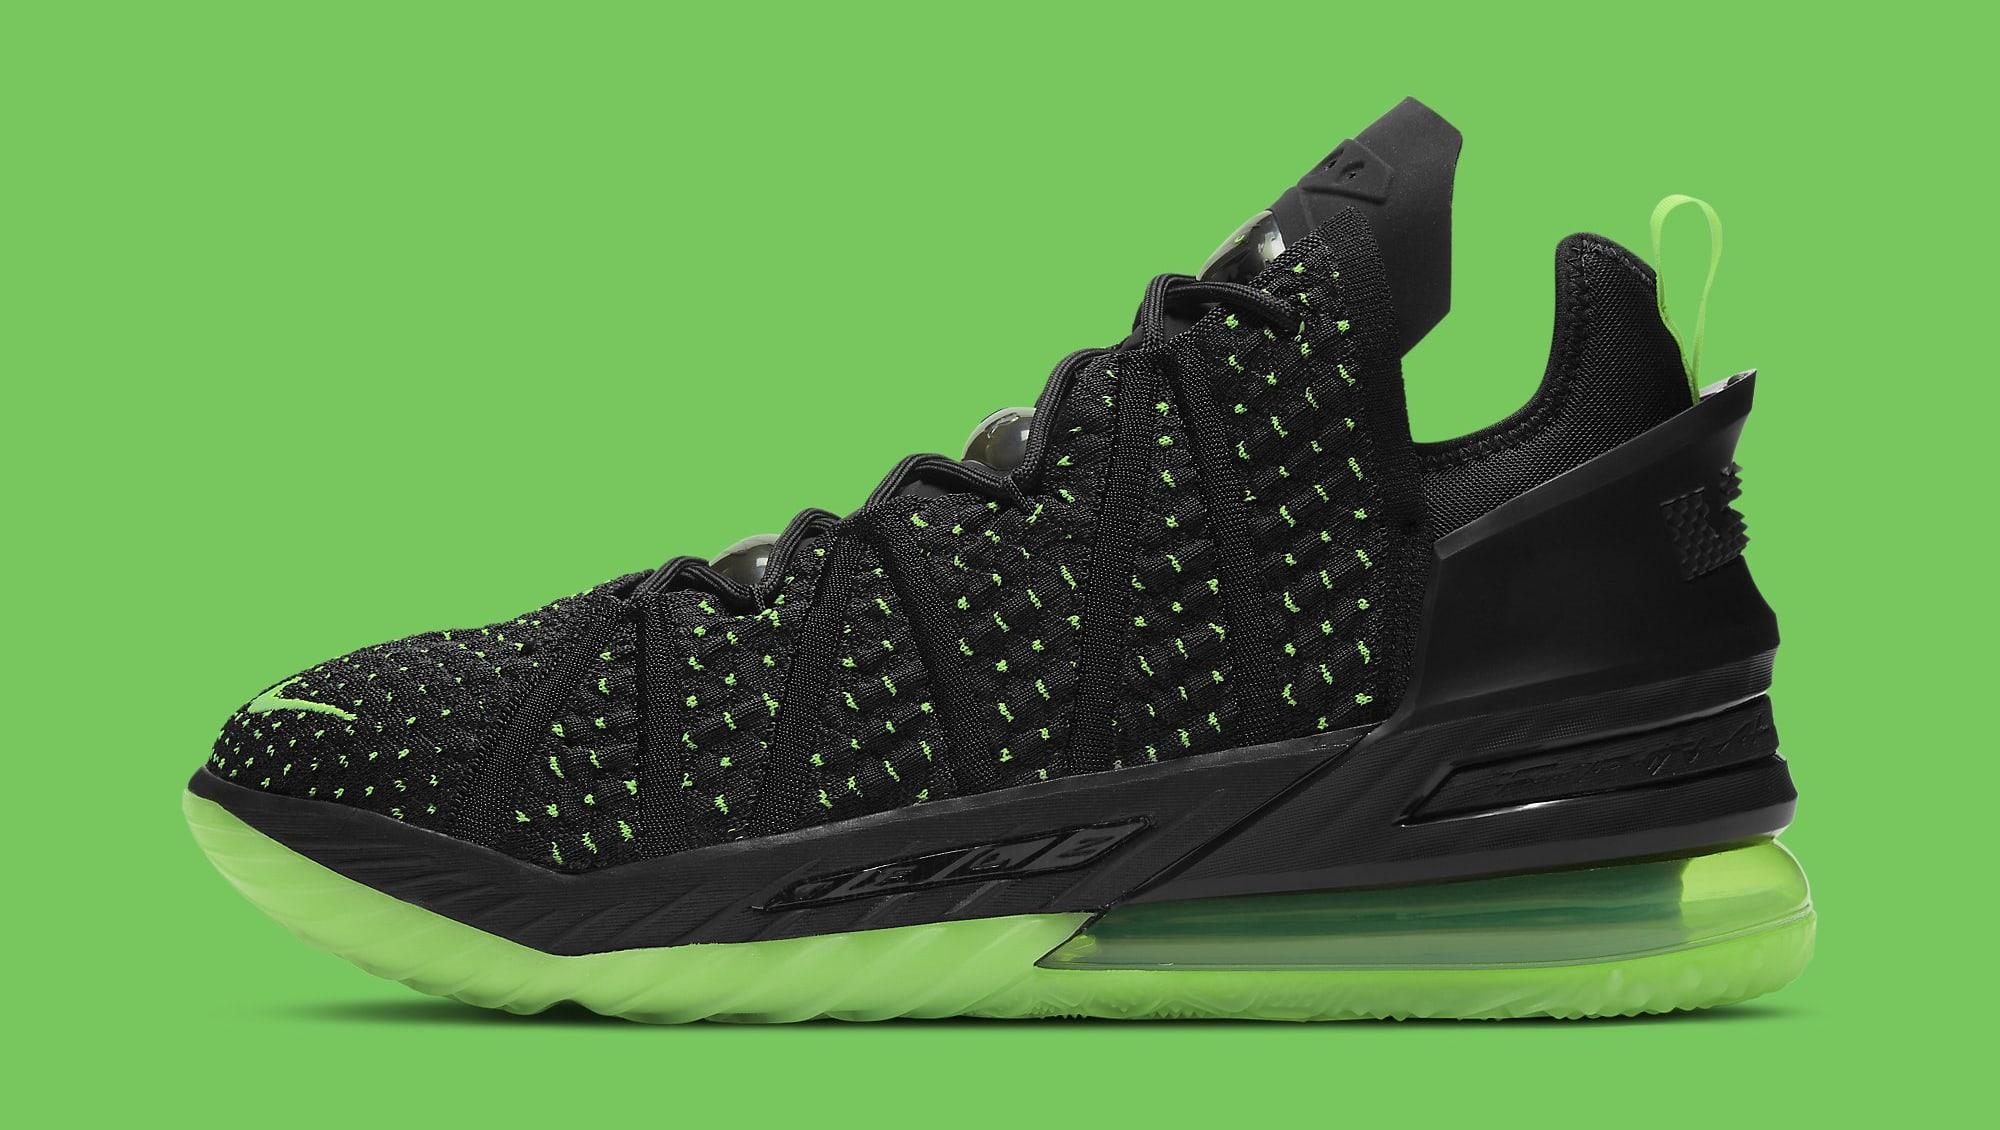 Nike LeBron 18 'Dunkman' CQ9284-005 Lateral